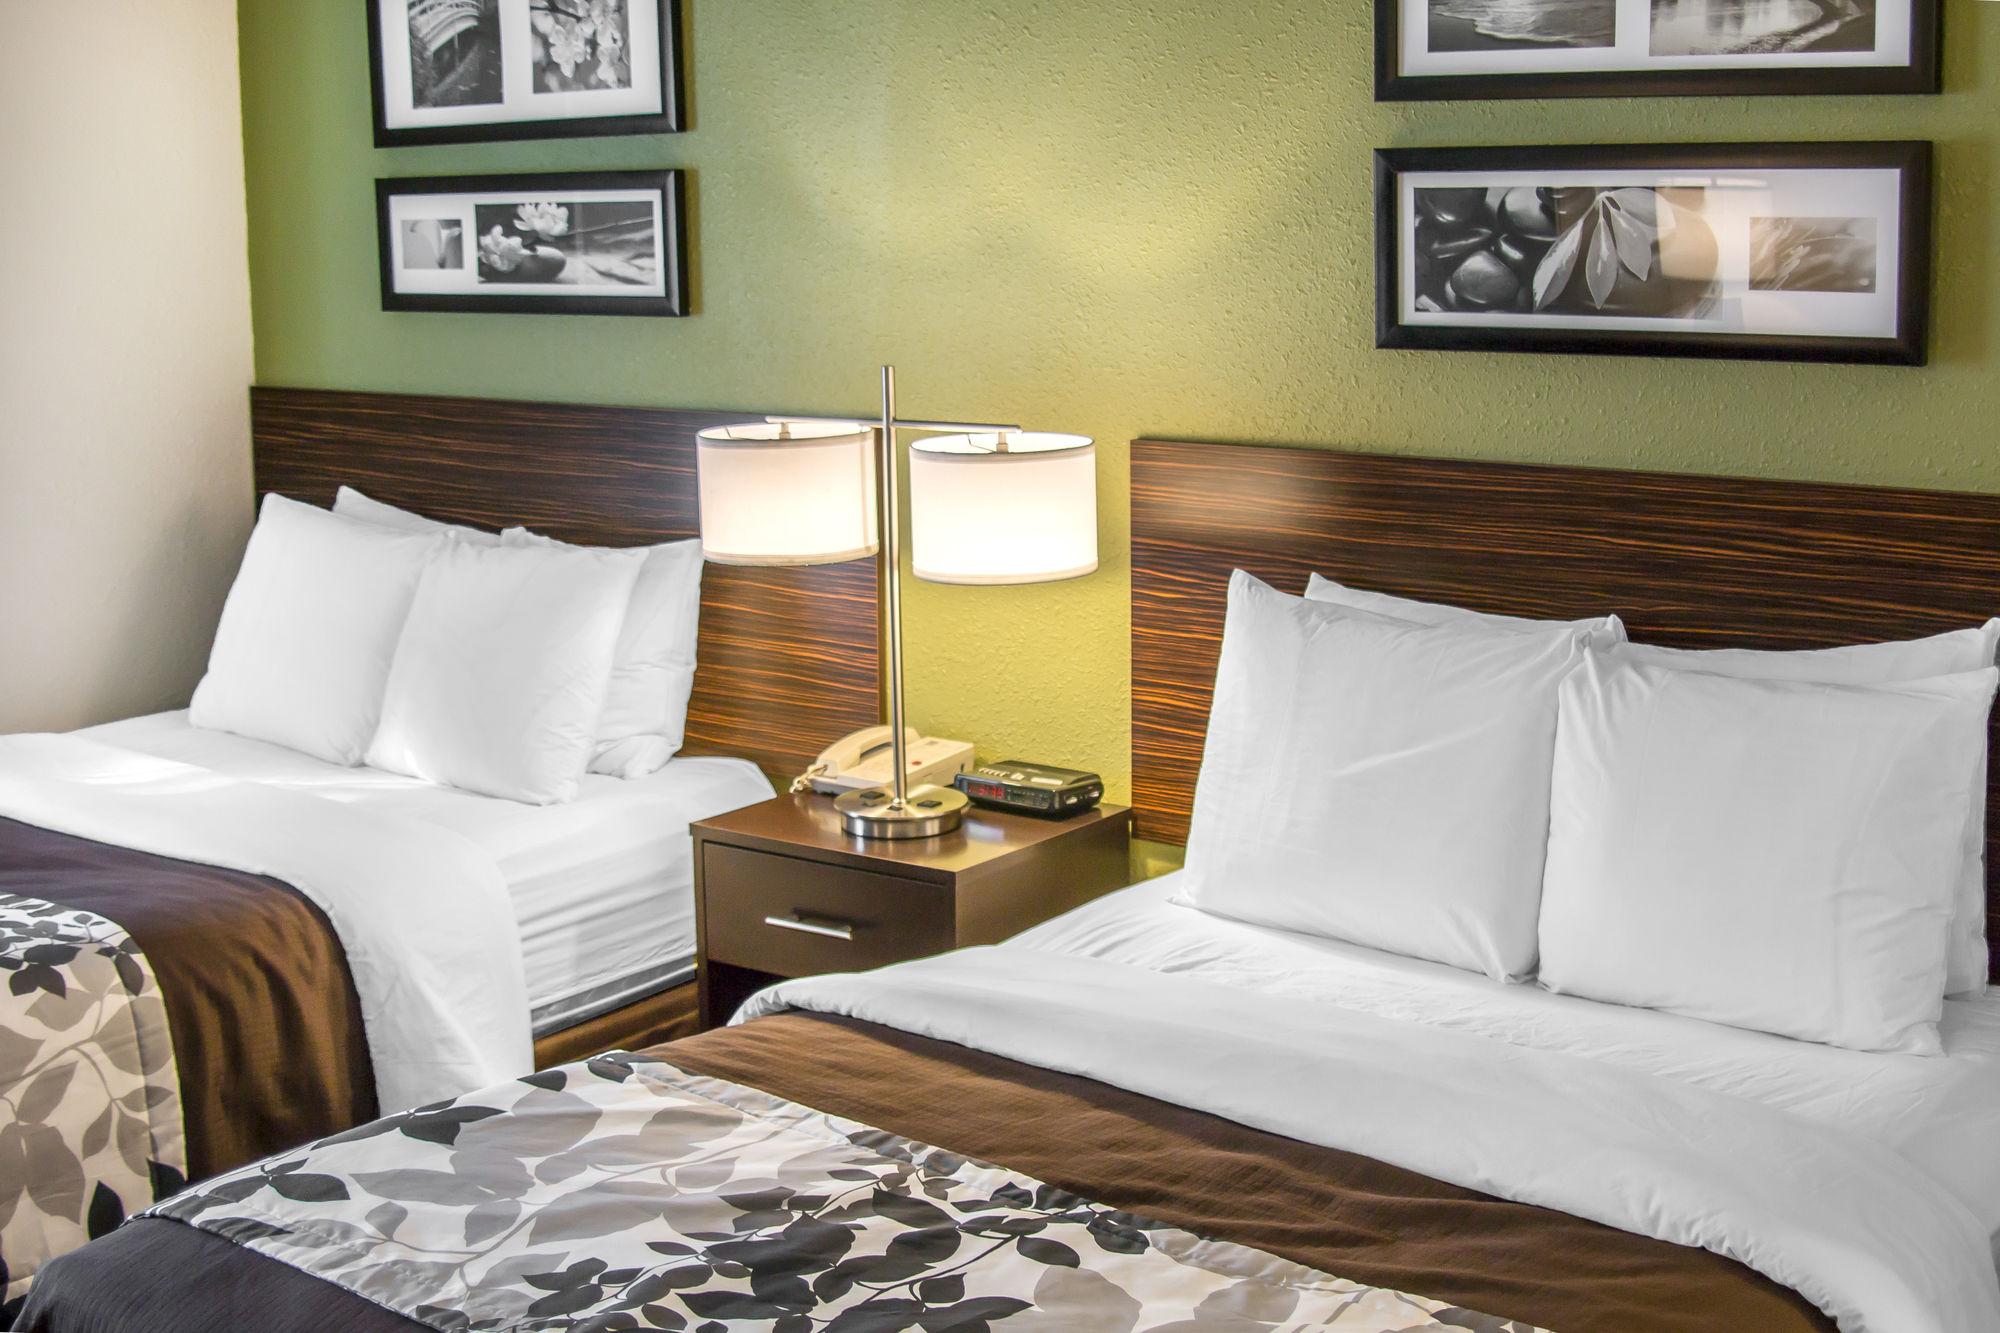 Missoula Hotel Coupons For Missoula Montana